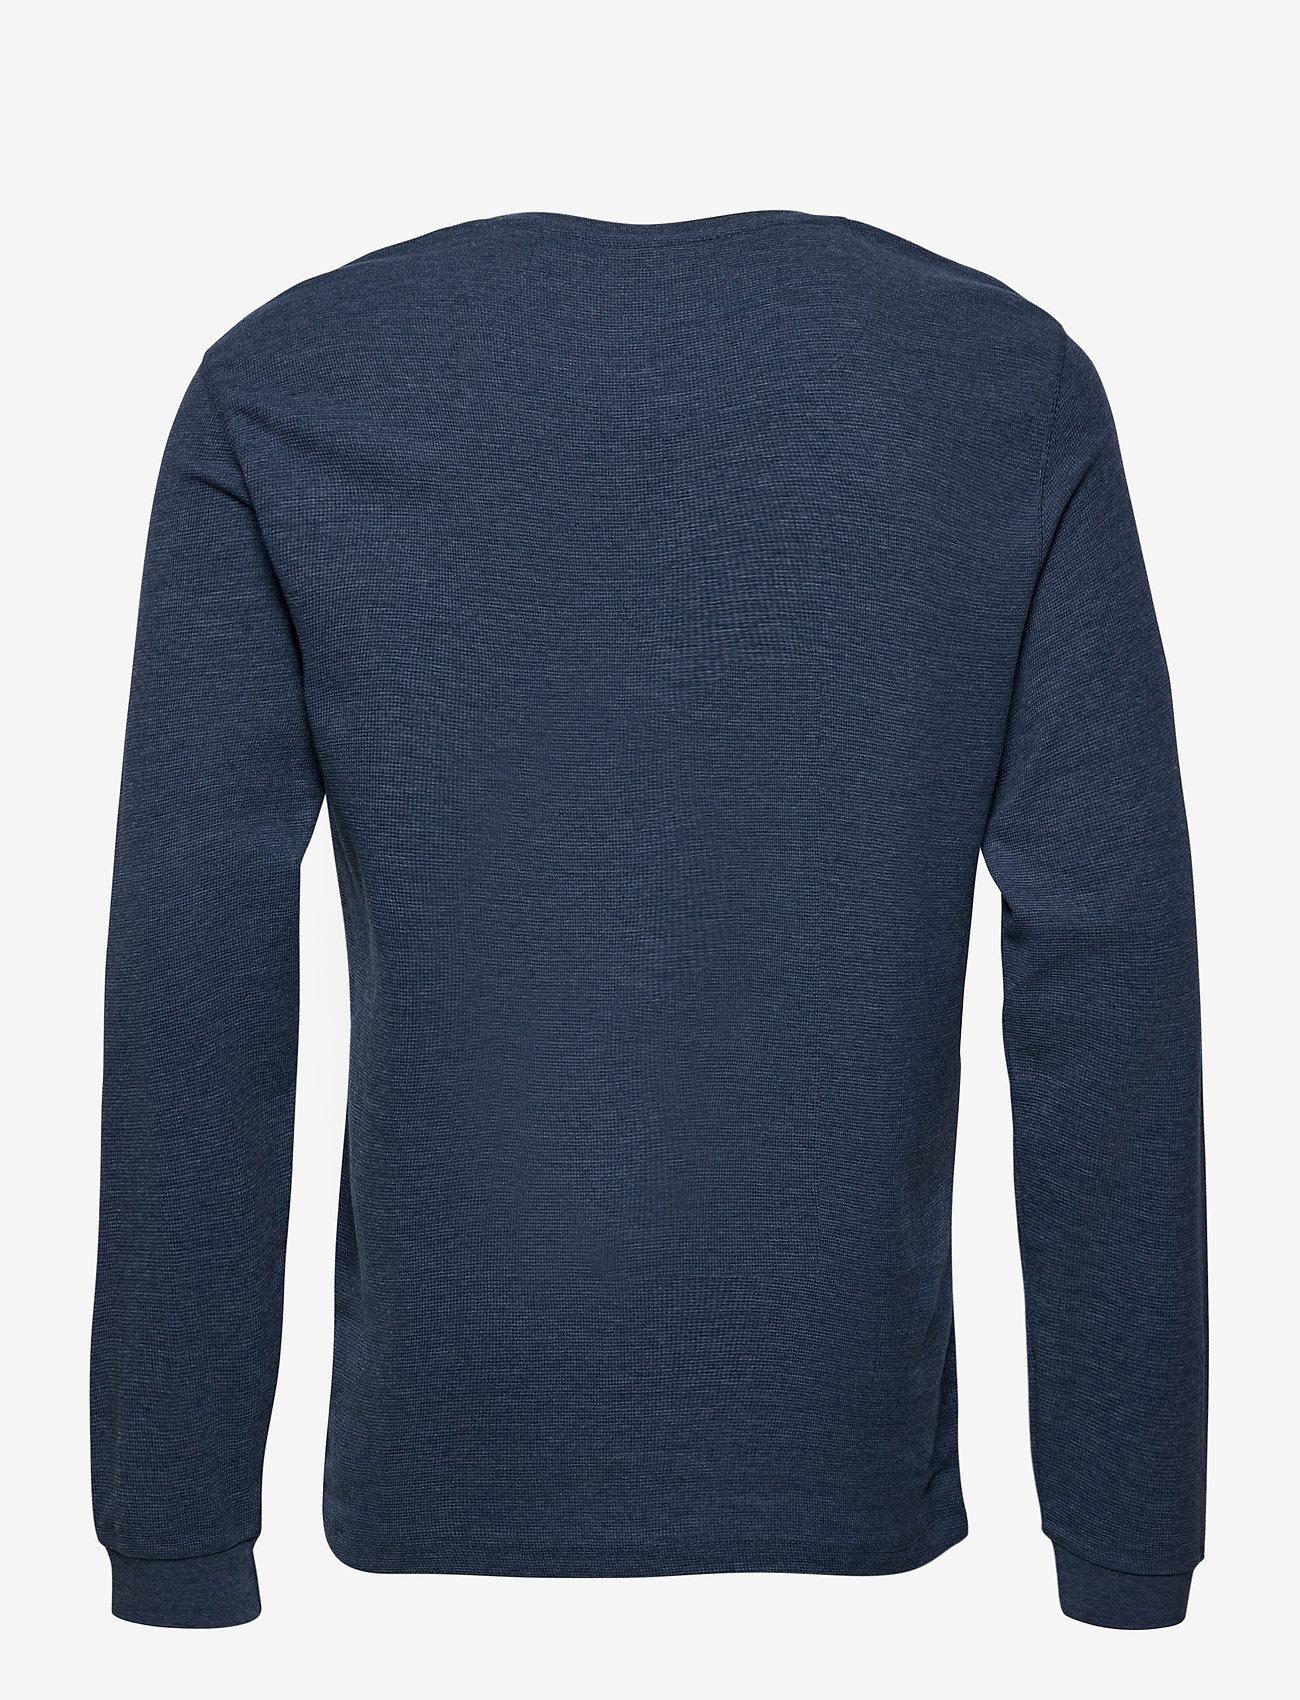 Blend - T-shirt - t-shirts basiques - dark denim - 1